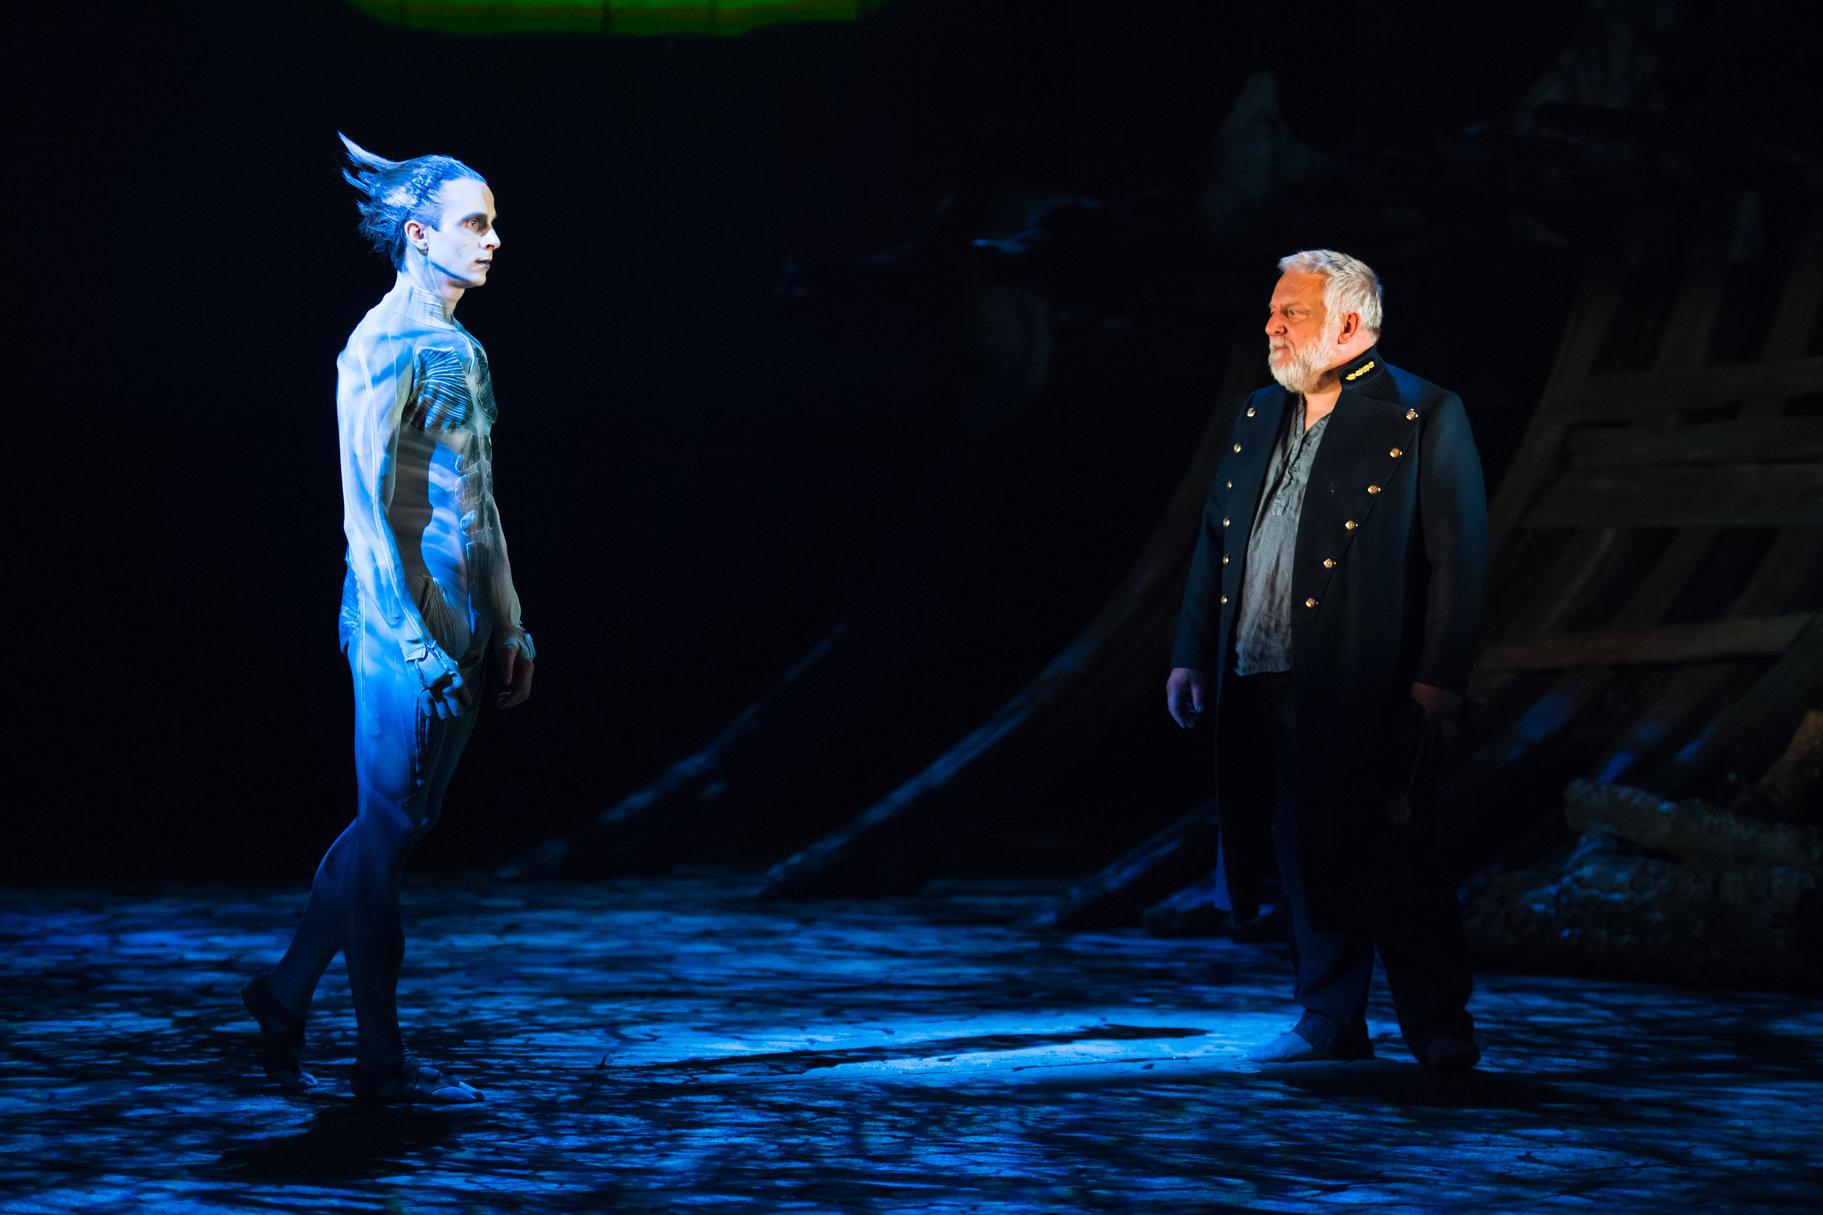 Ariel approaches Prospero